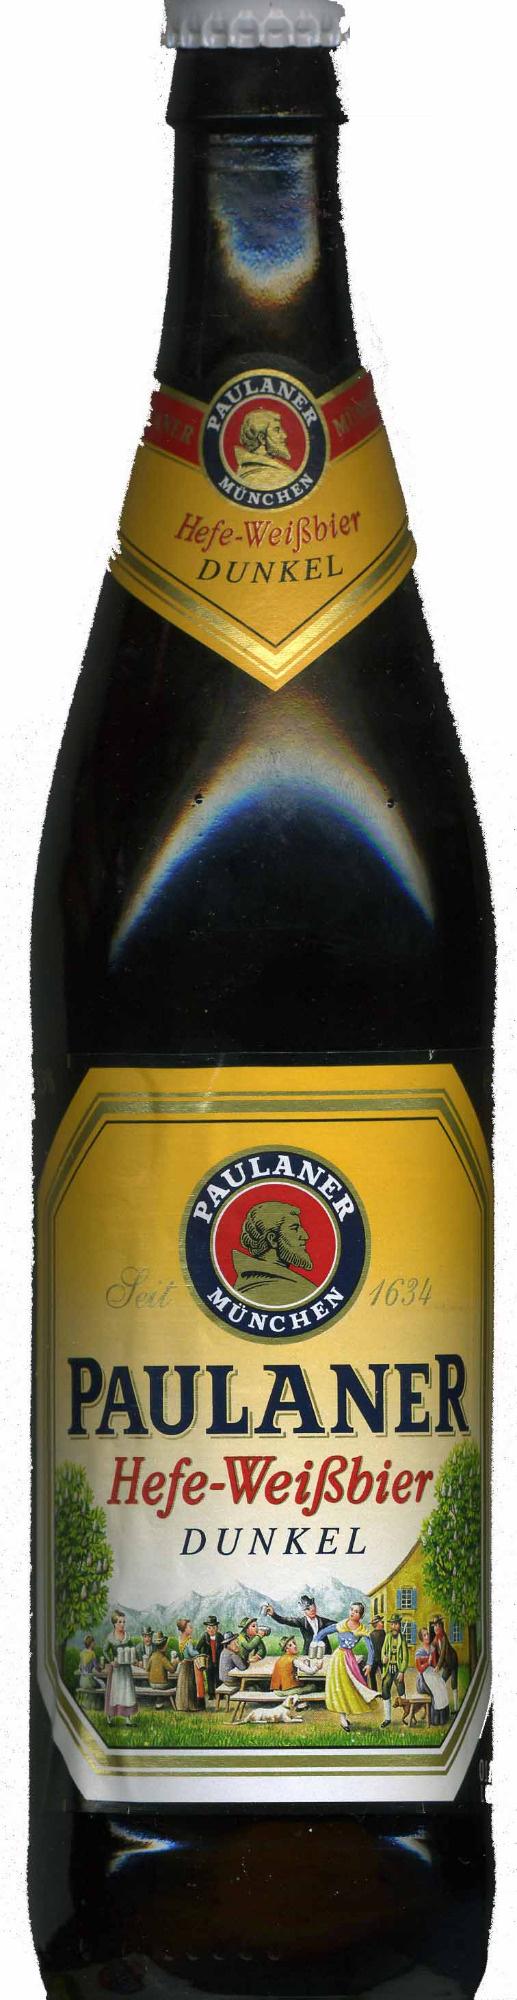 "Cerveza ""Paulaner"" Hefe-Weißbier Dunkel - Producte - es"